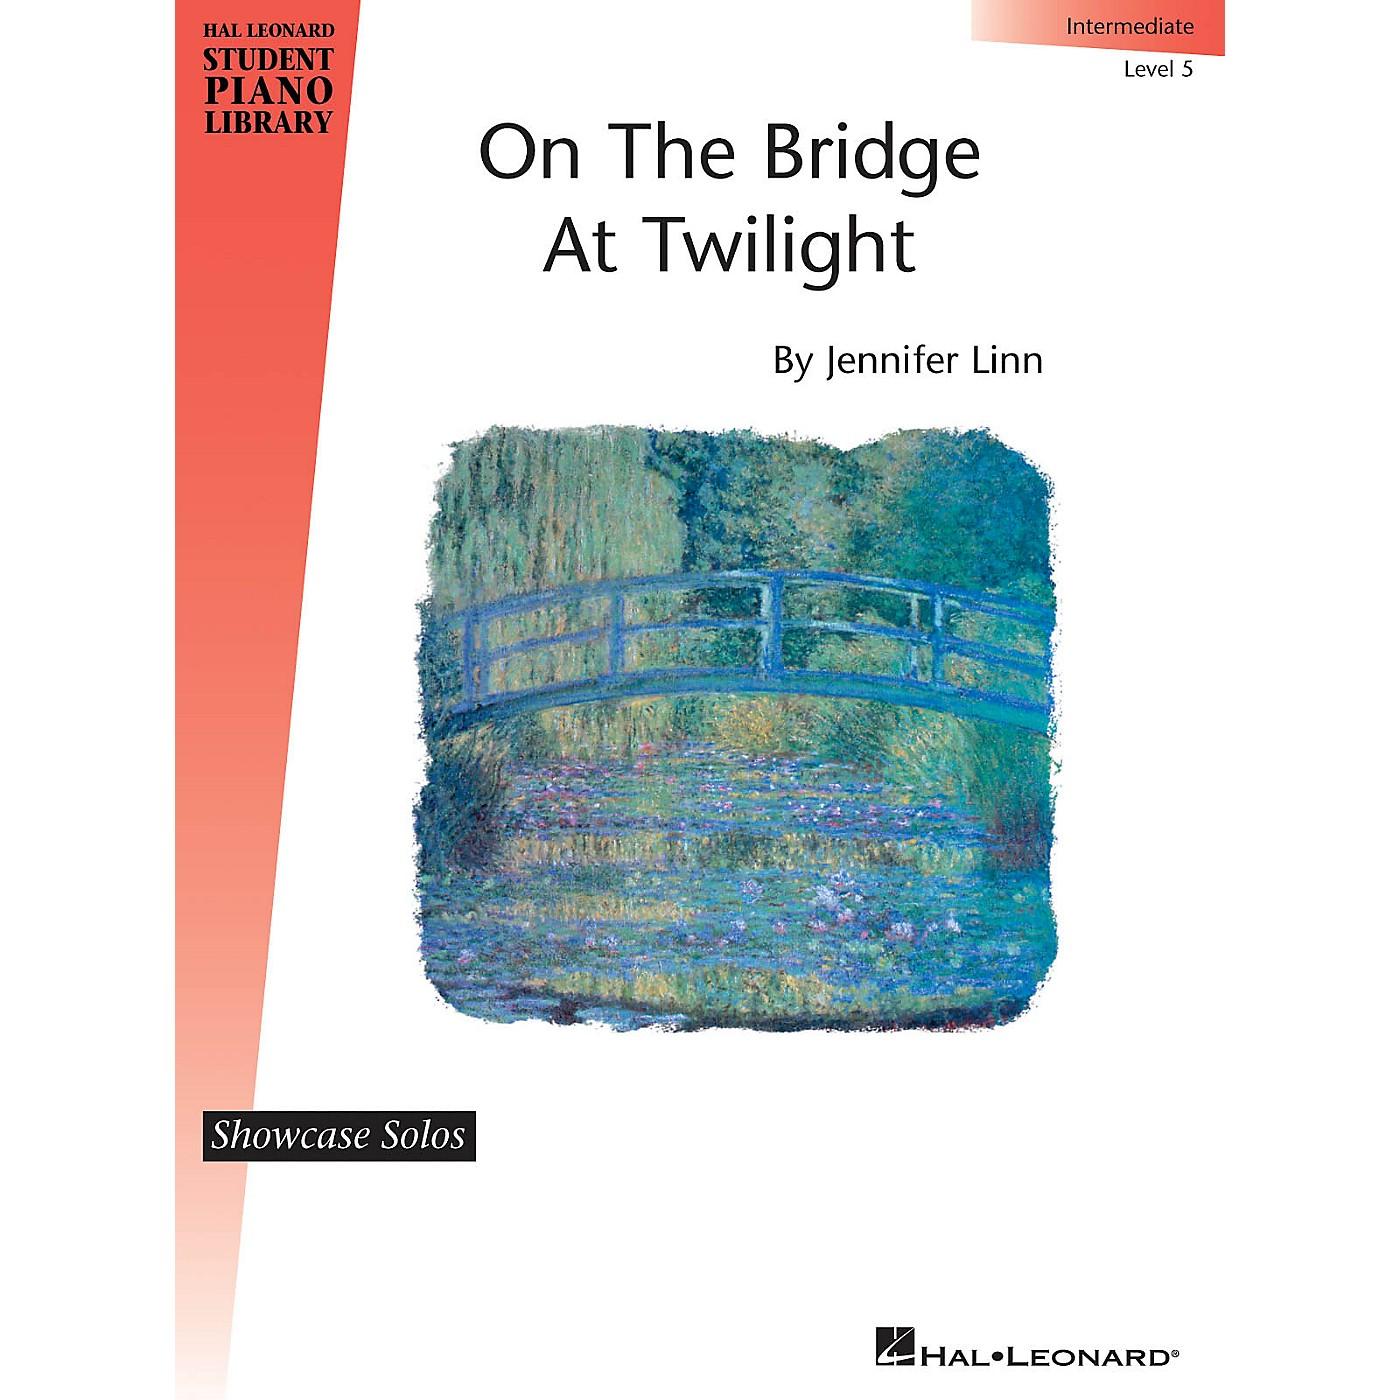 Hal Leonard On the Bridge at Twilight Piano Library Series by Jennifer Linn (Level Inter) thumbnail